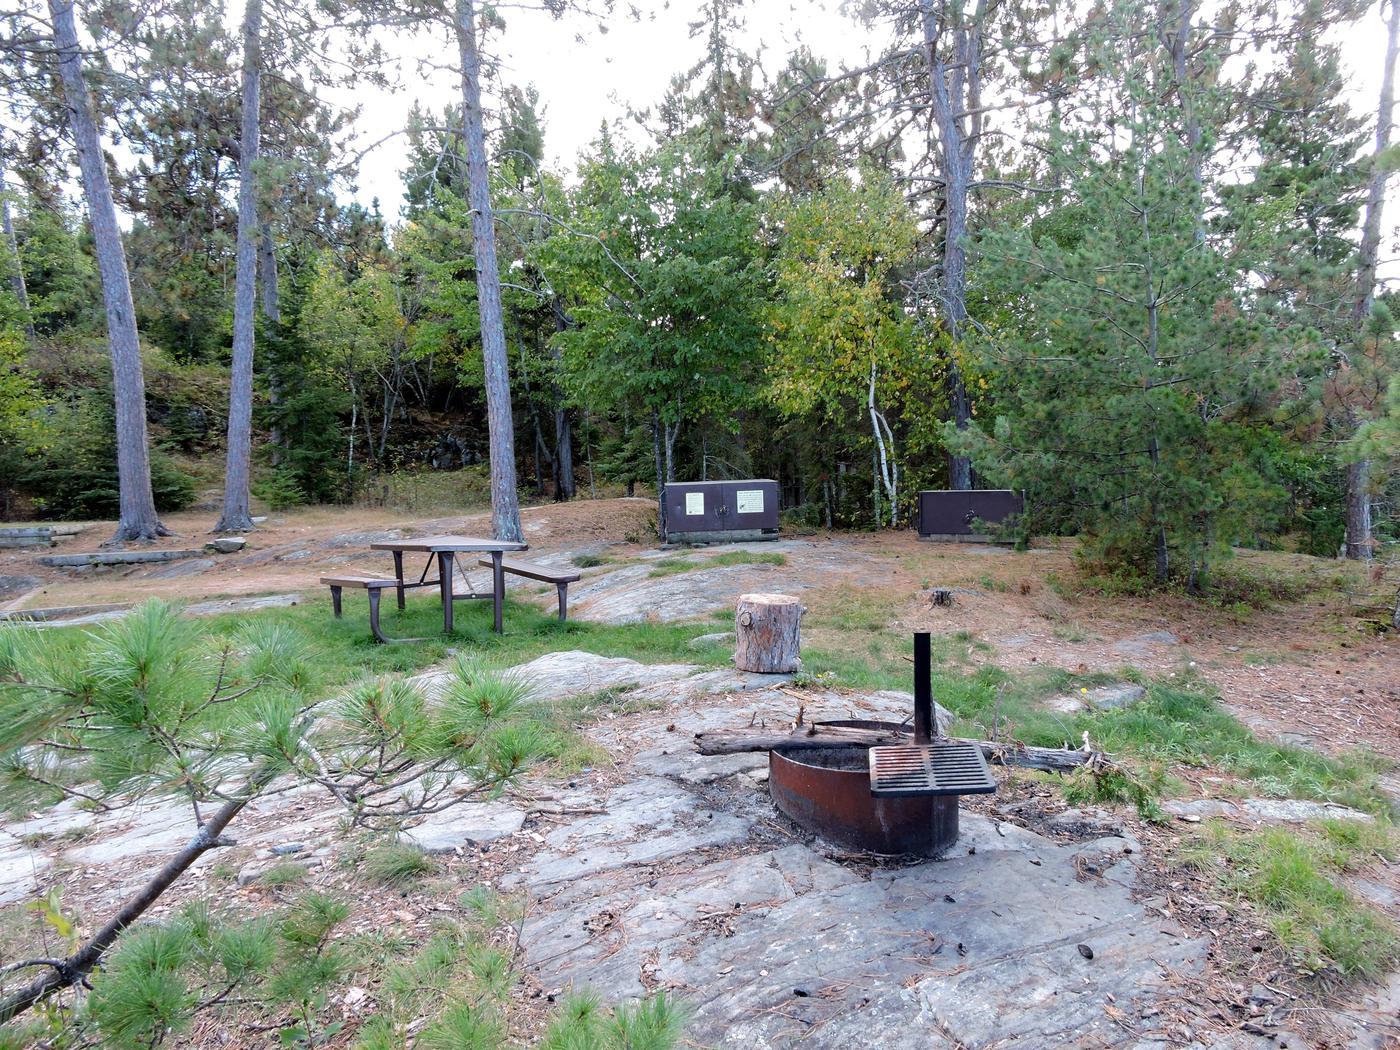 R67 - Stones PointView of campsite